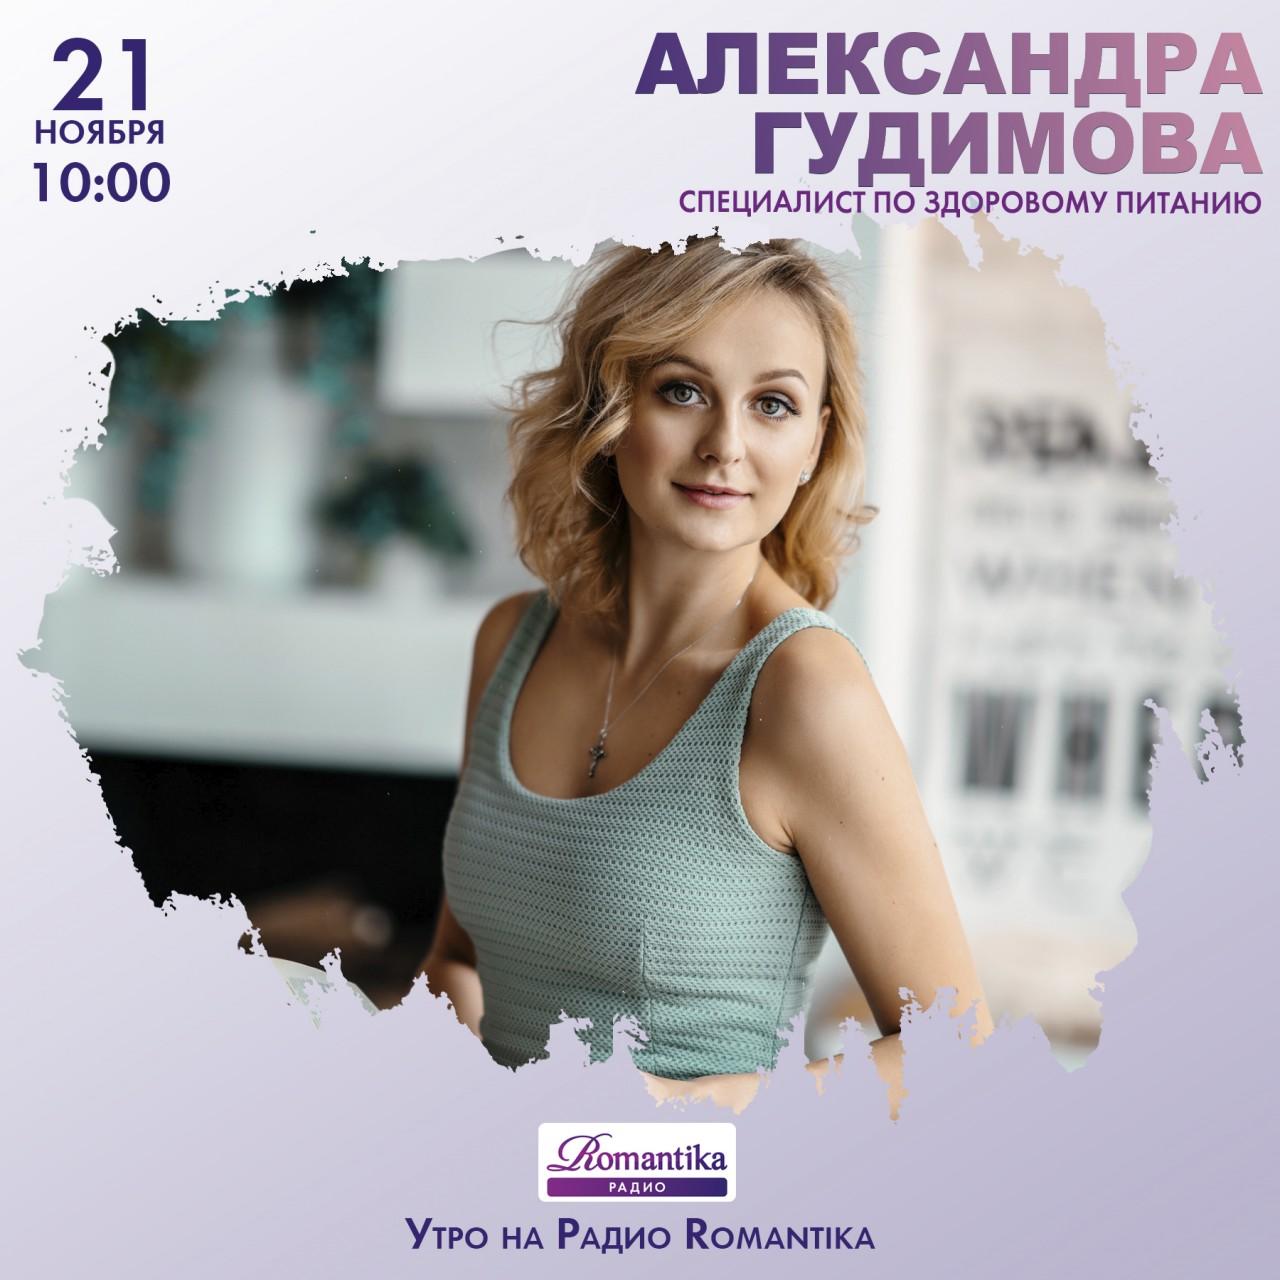 Радио Romantika: 21 ноября - специалист по здоровому питанию Александра Гудимова